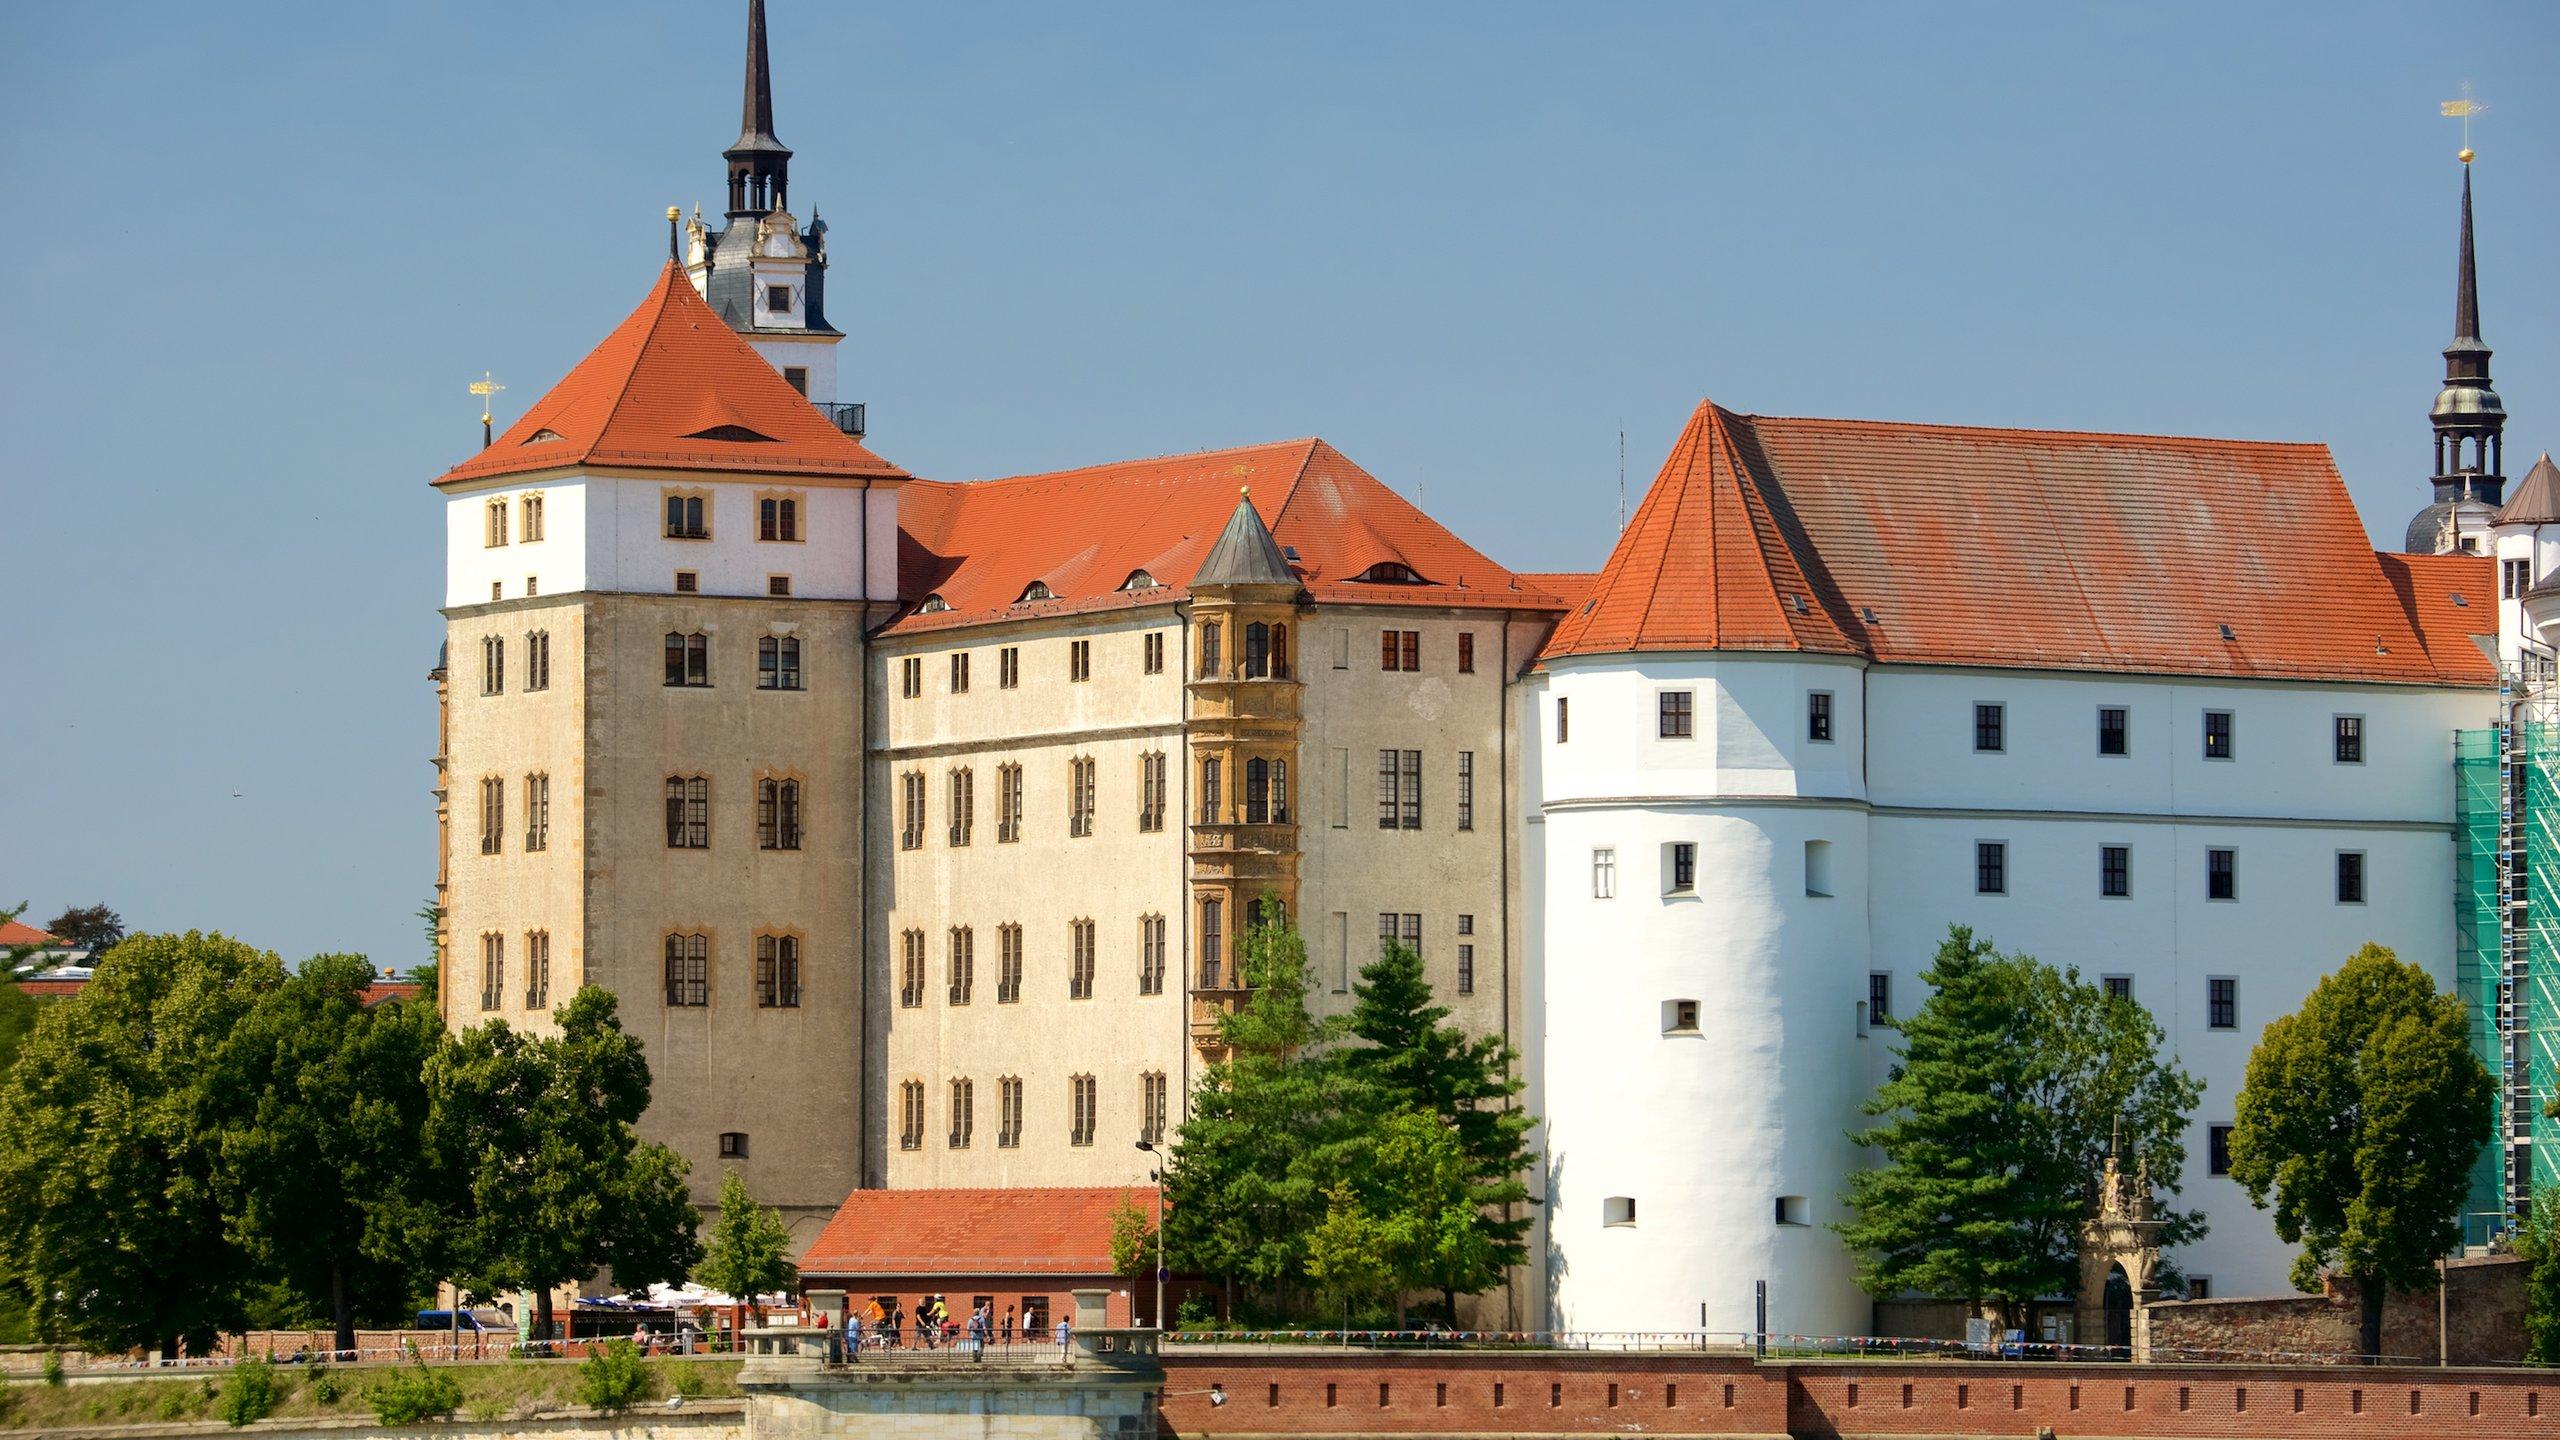 Torgau, Saxony, Germany